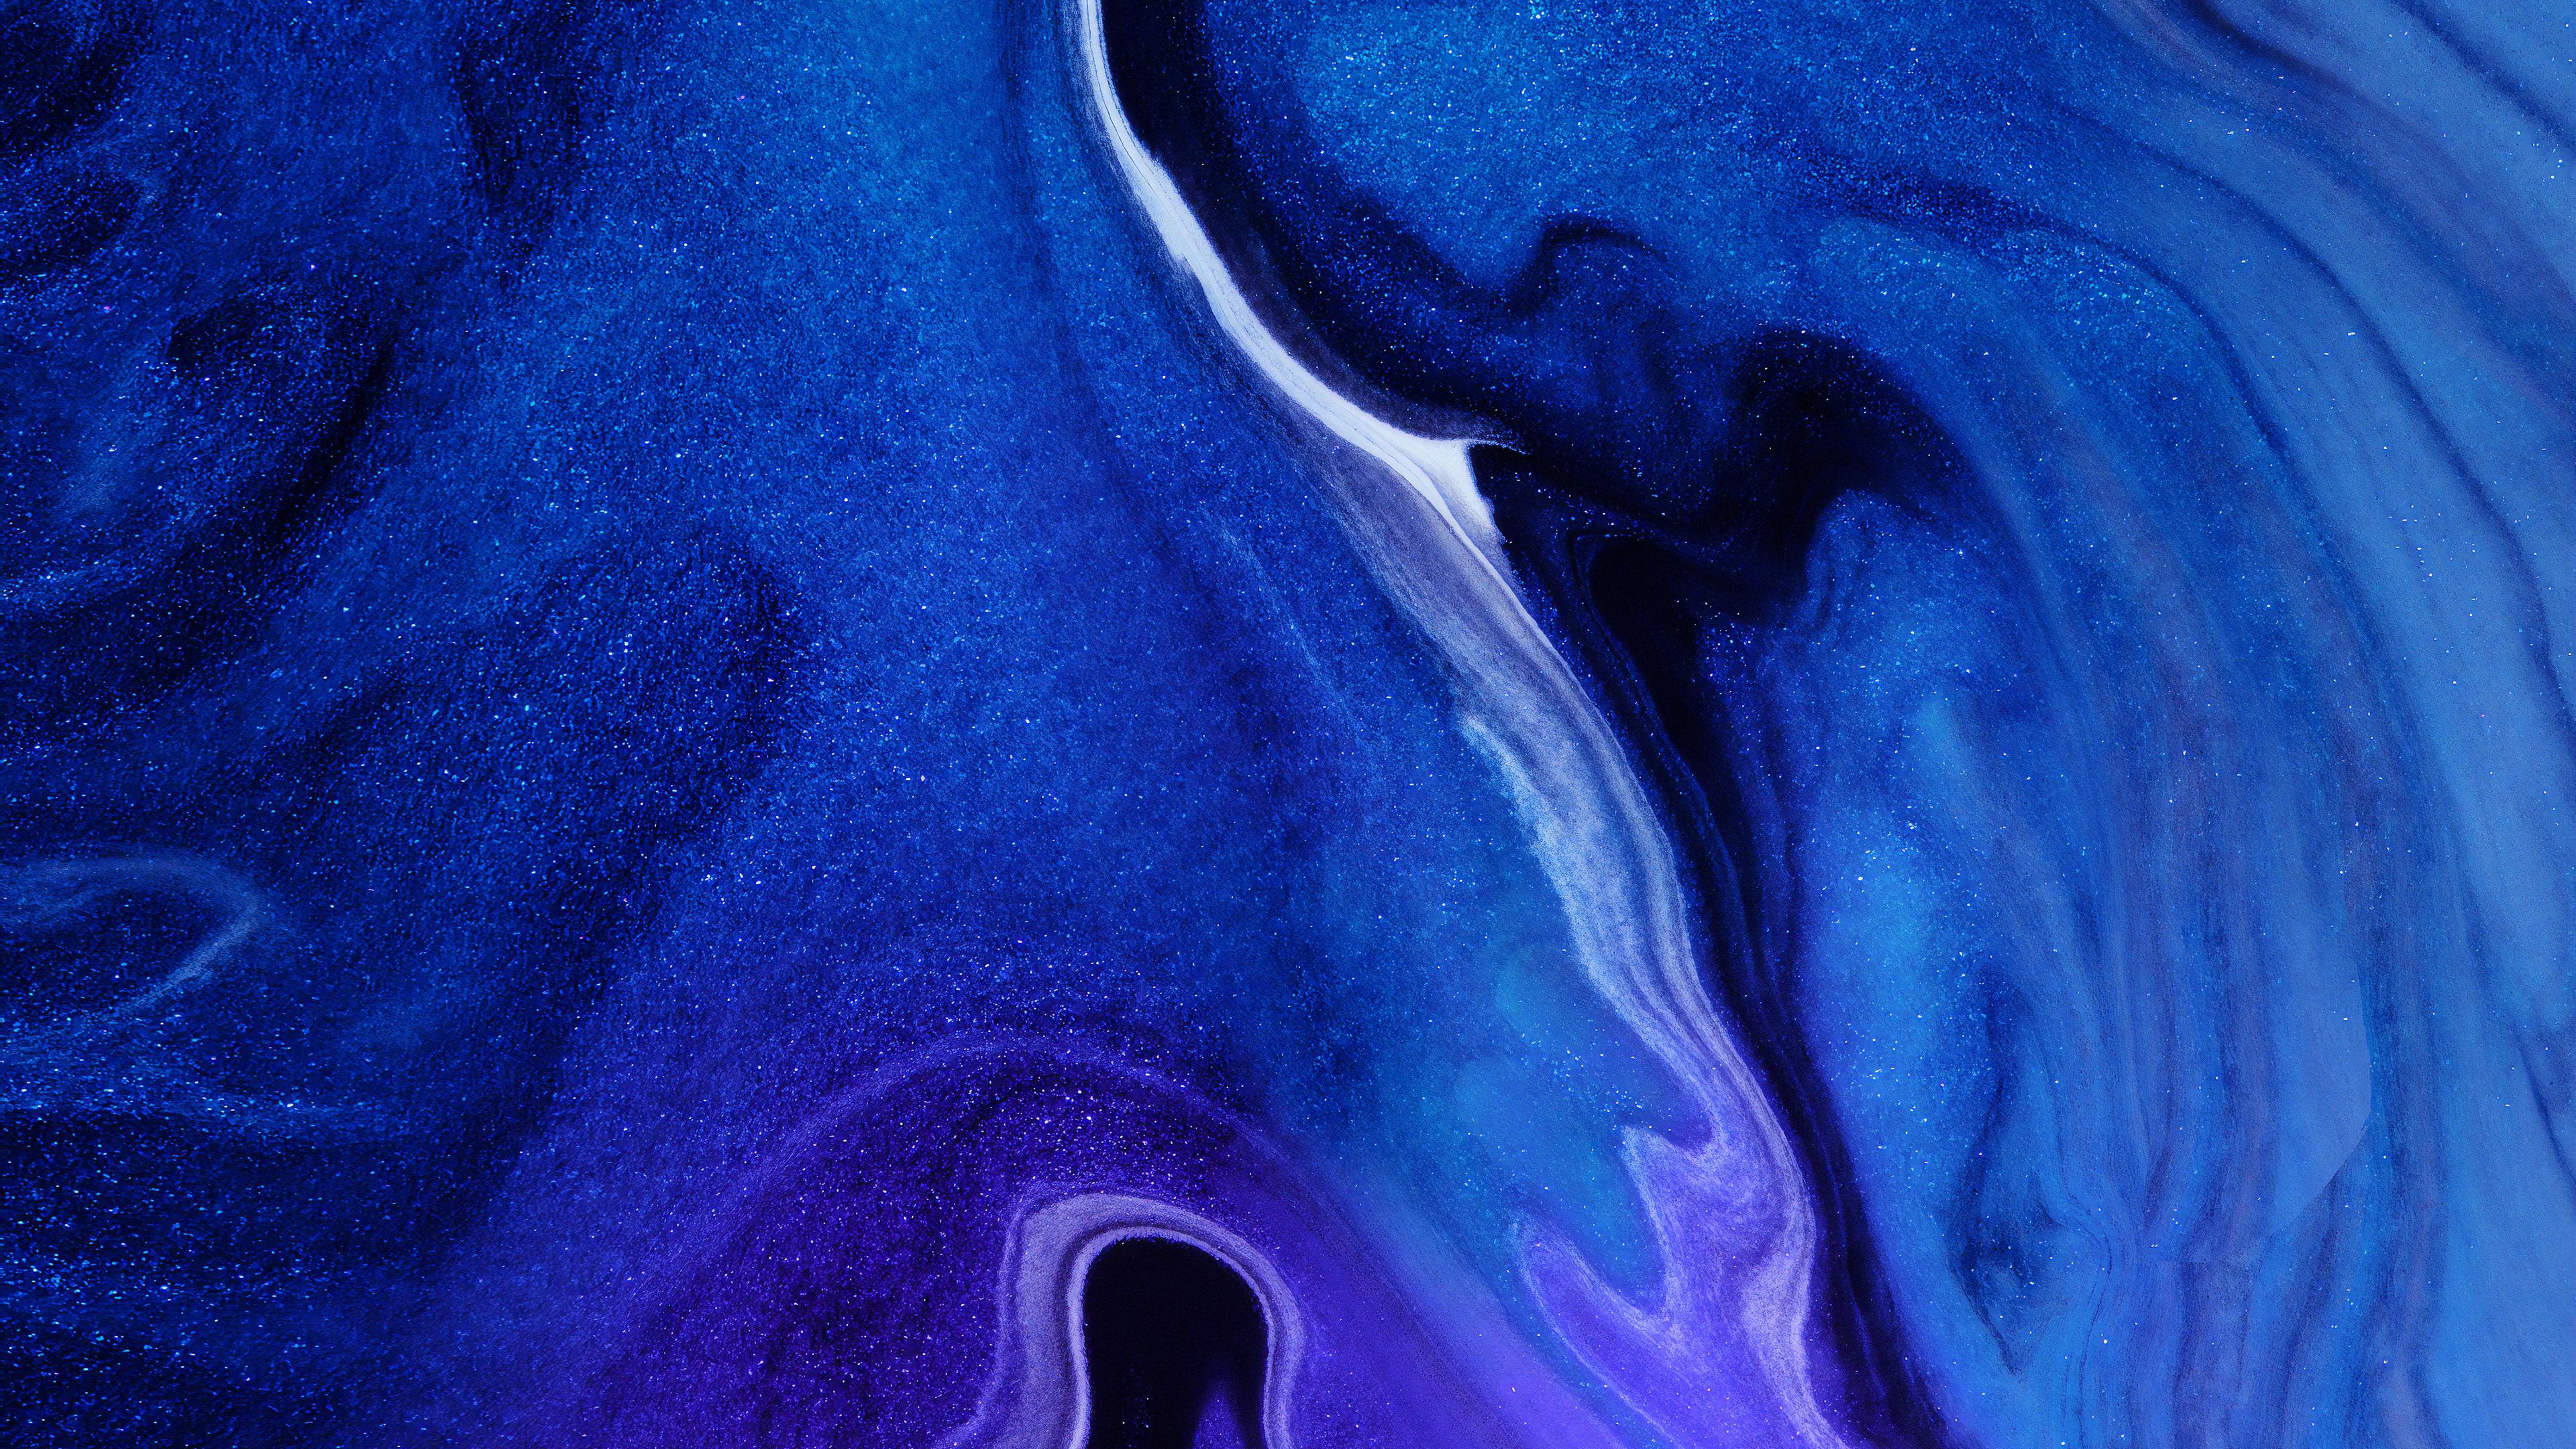 Dark Blue Color Burst 4k, HD Abstract, 4k Wallpapers ...